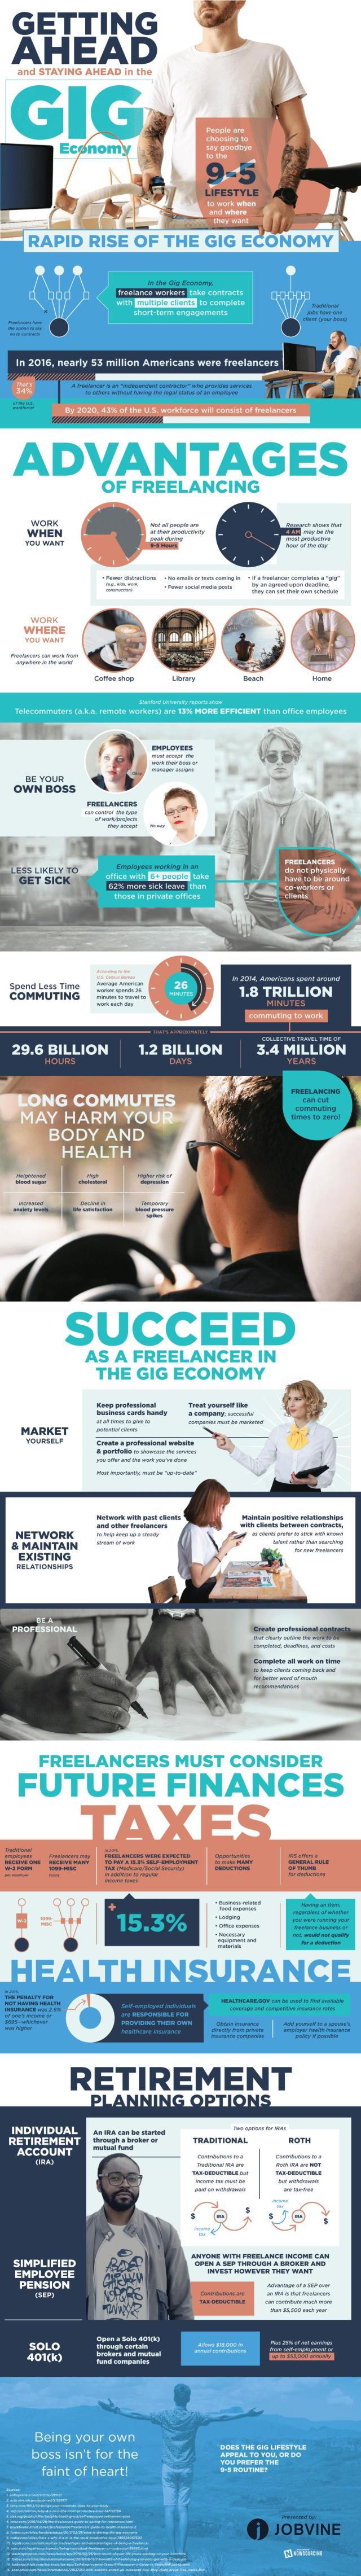 Getting Economy info